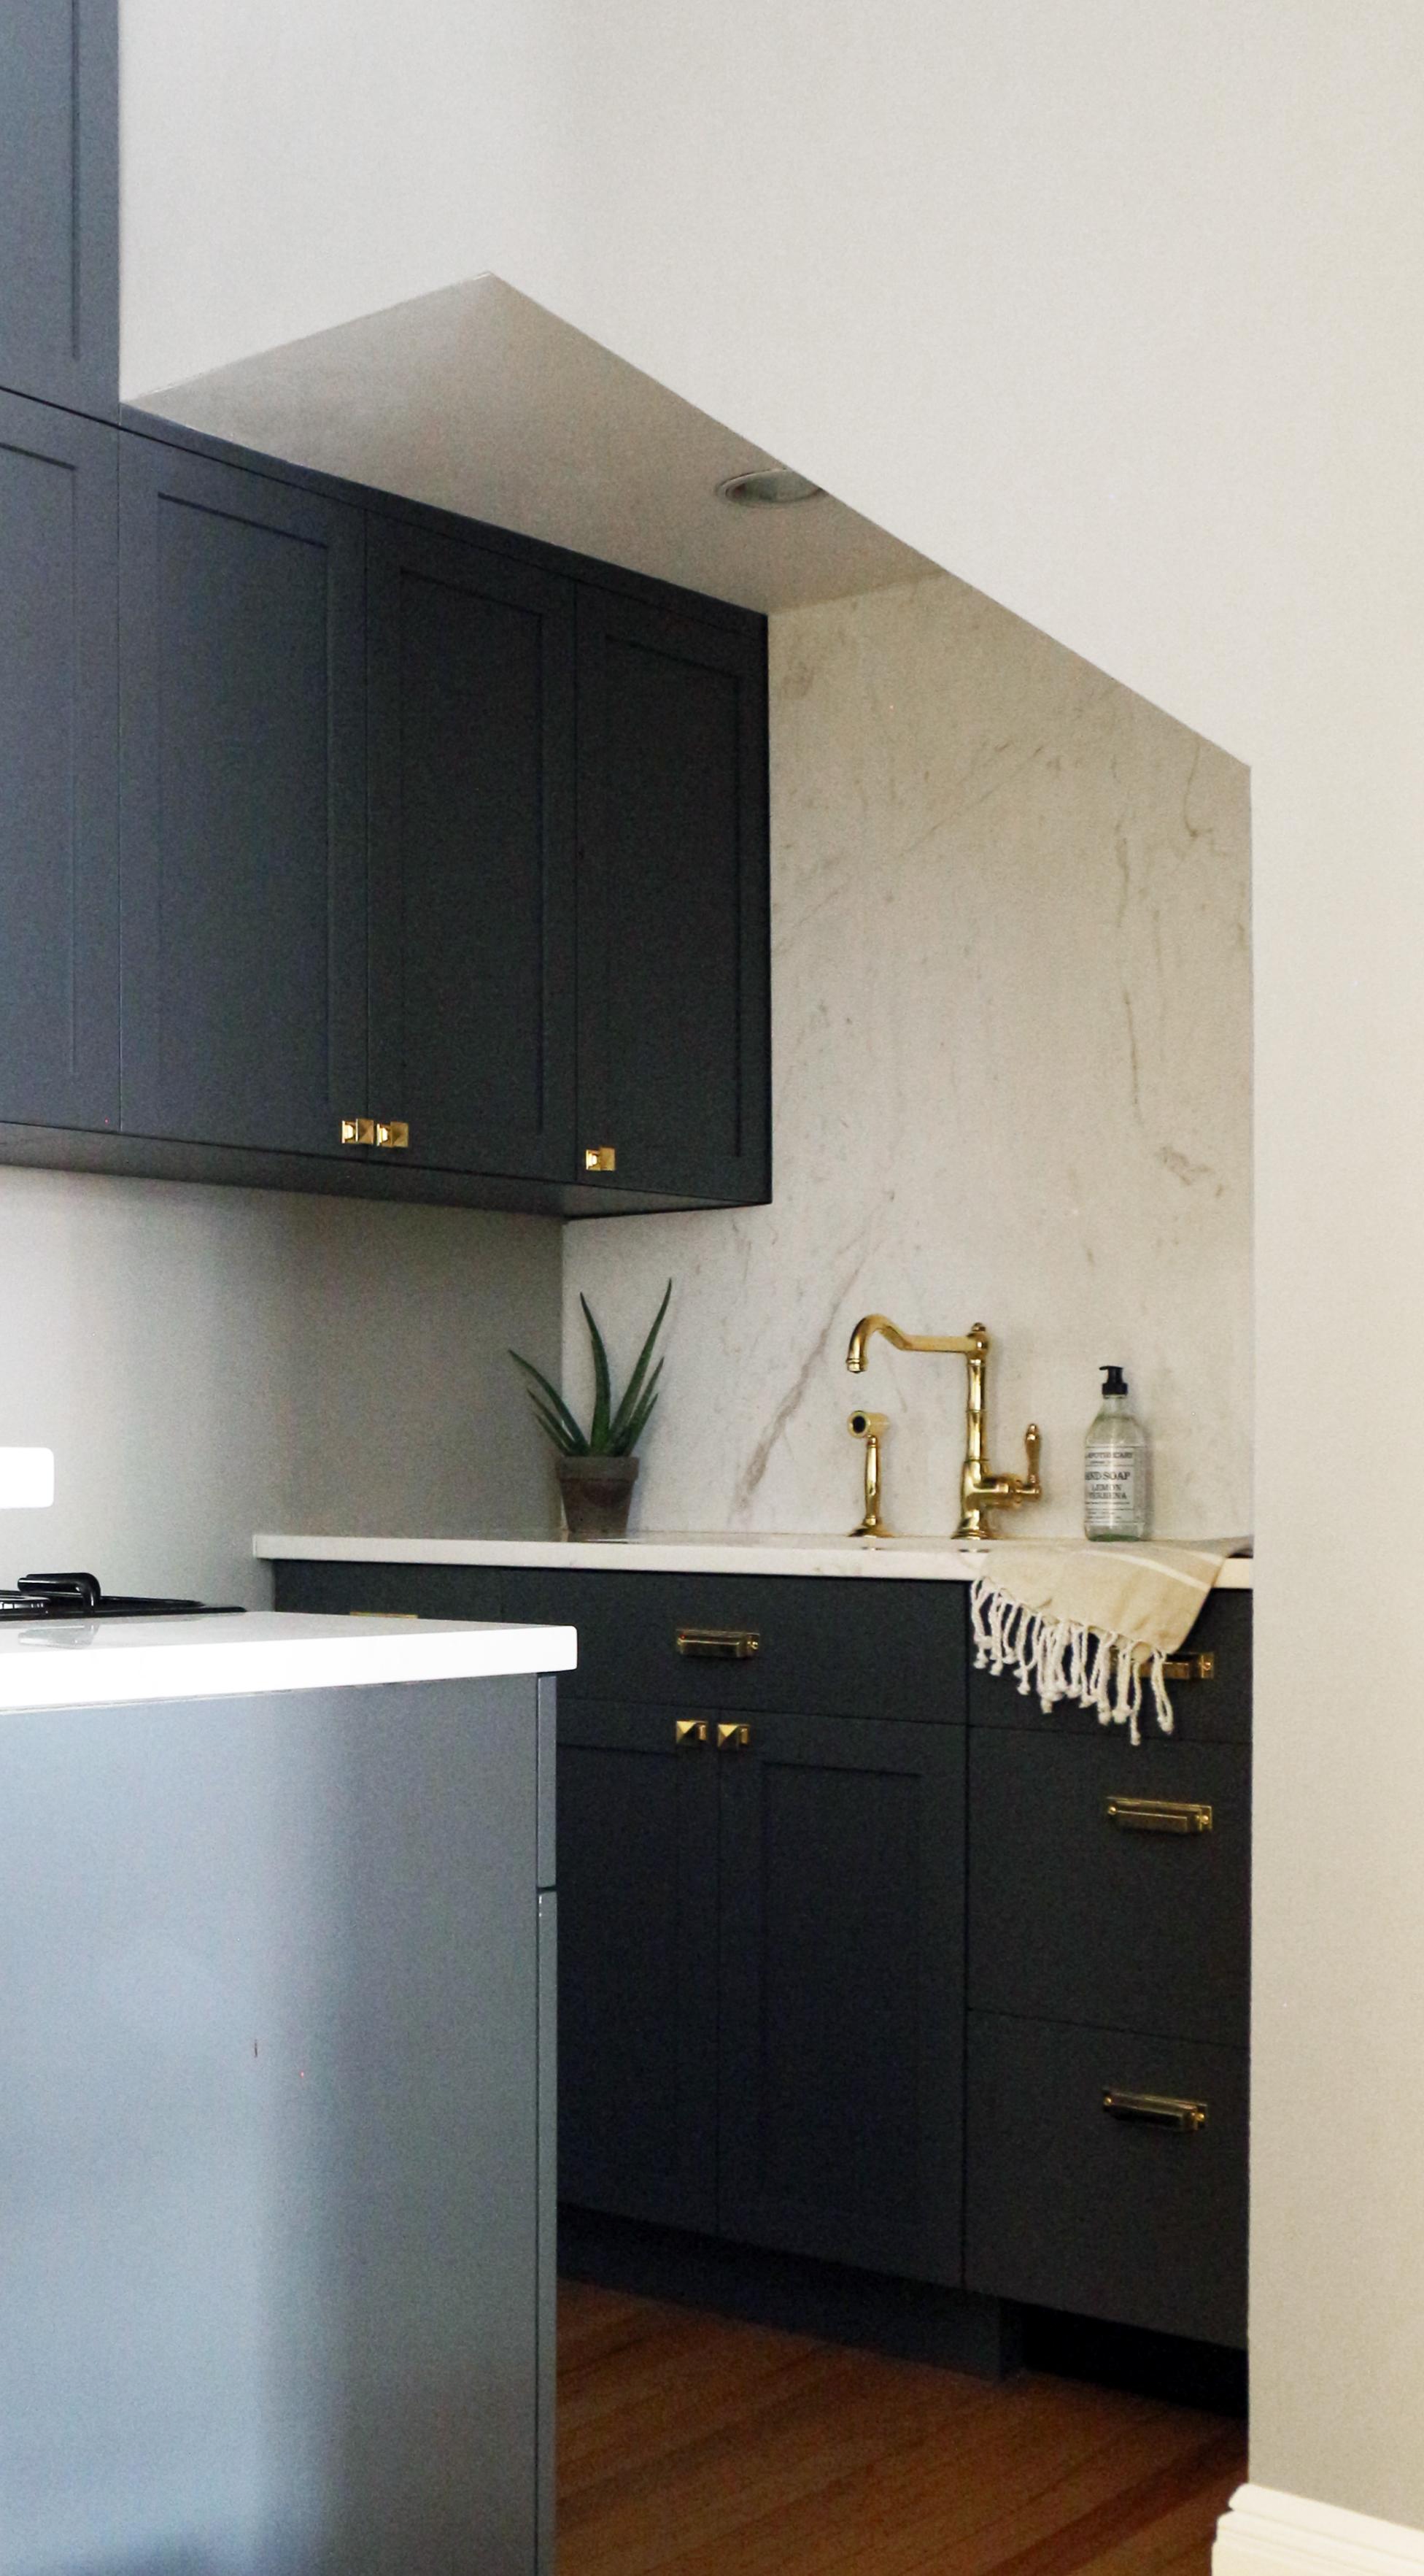 patrick-kitchen-6.jpg